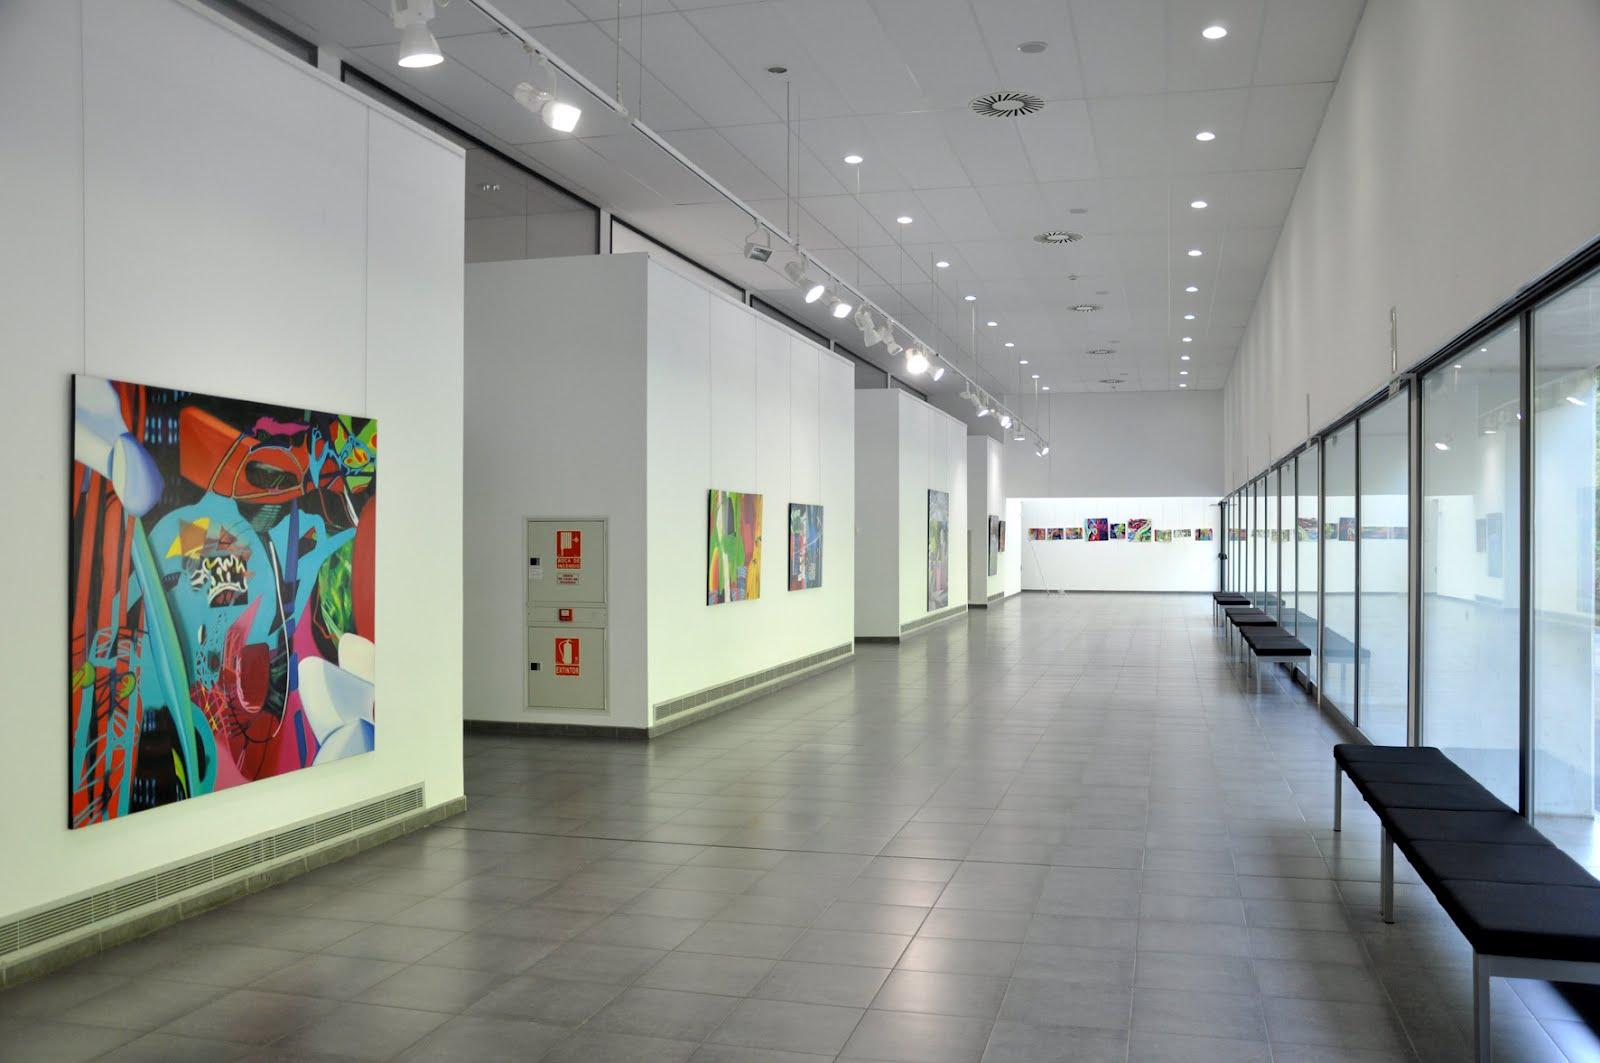 Beatriz r podas exposicion individual civivox iturrama for Pinturas esquiroz